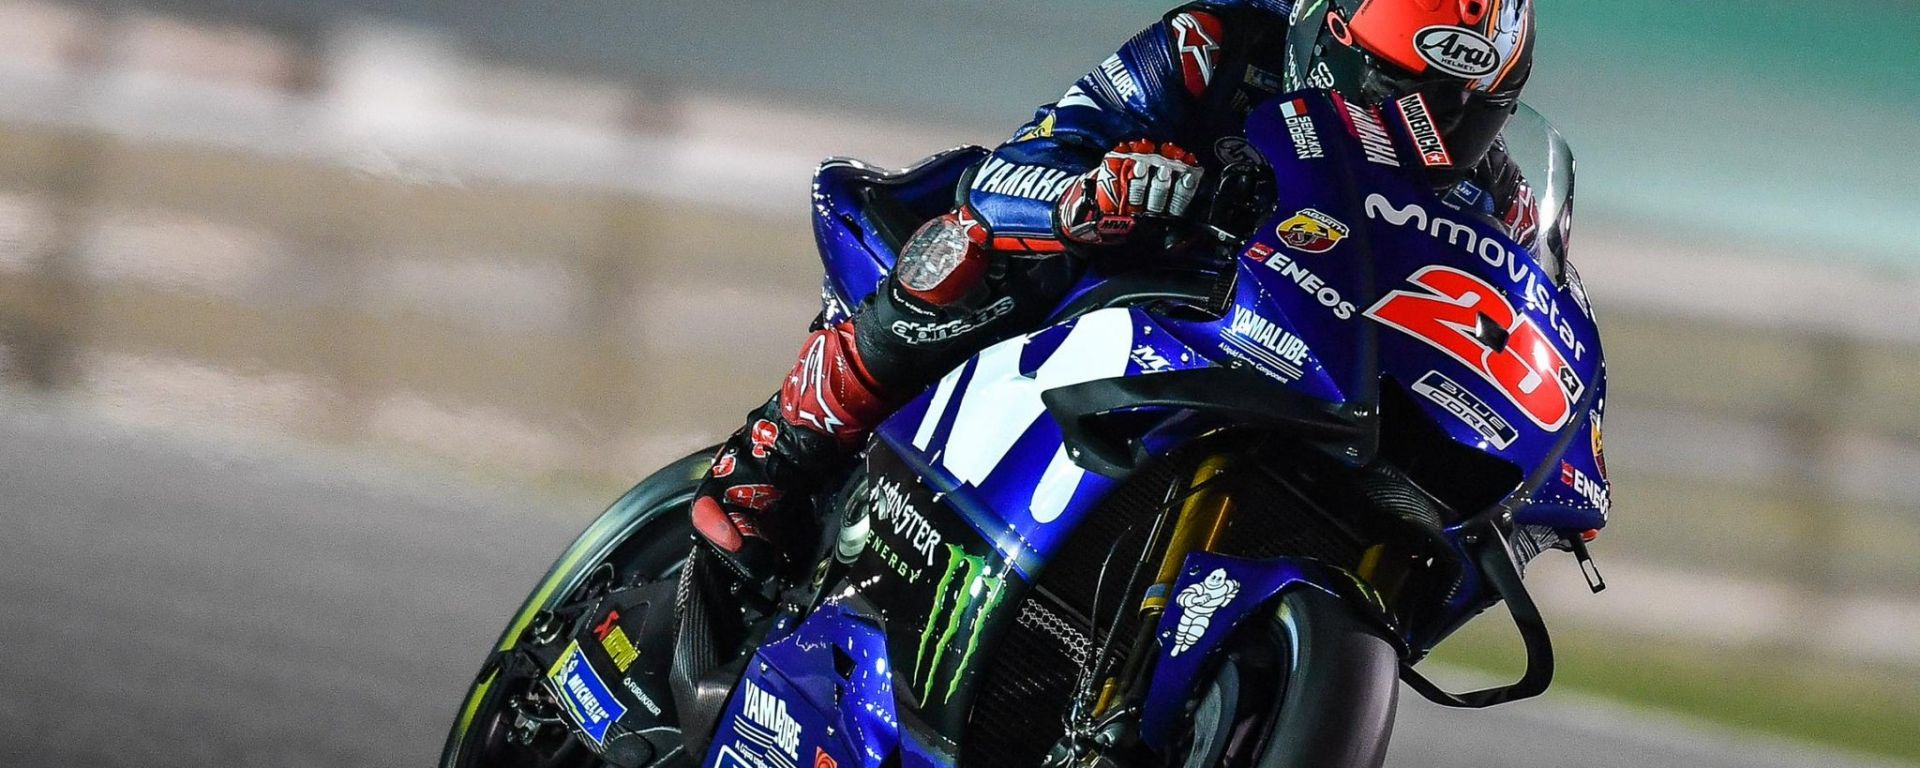 MotoGP 2018 Test Qatar Day 1, Maverick Vinales